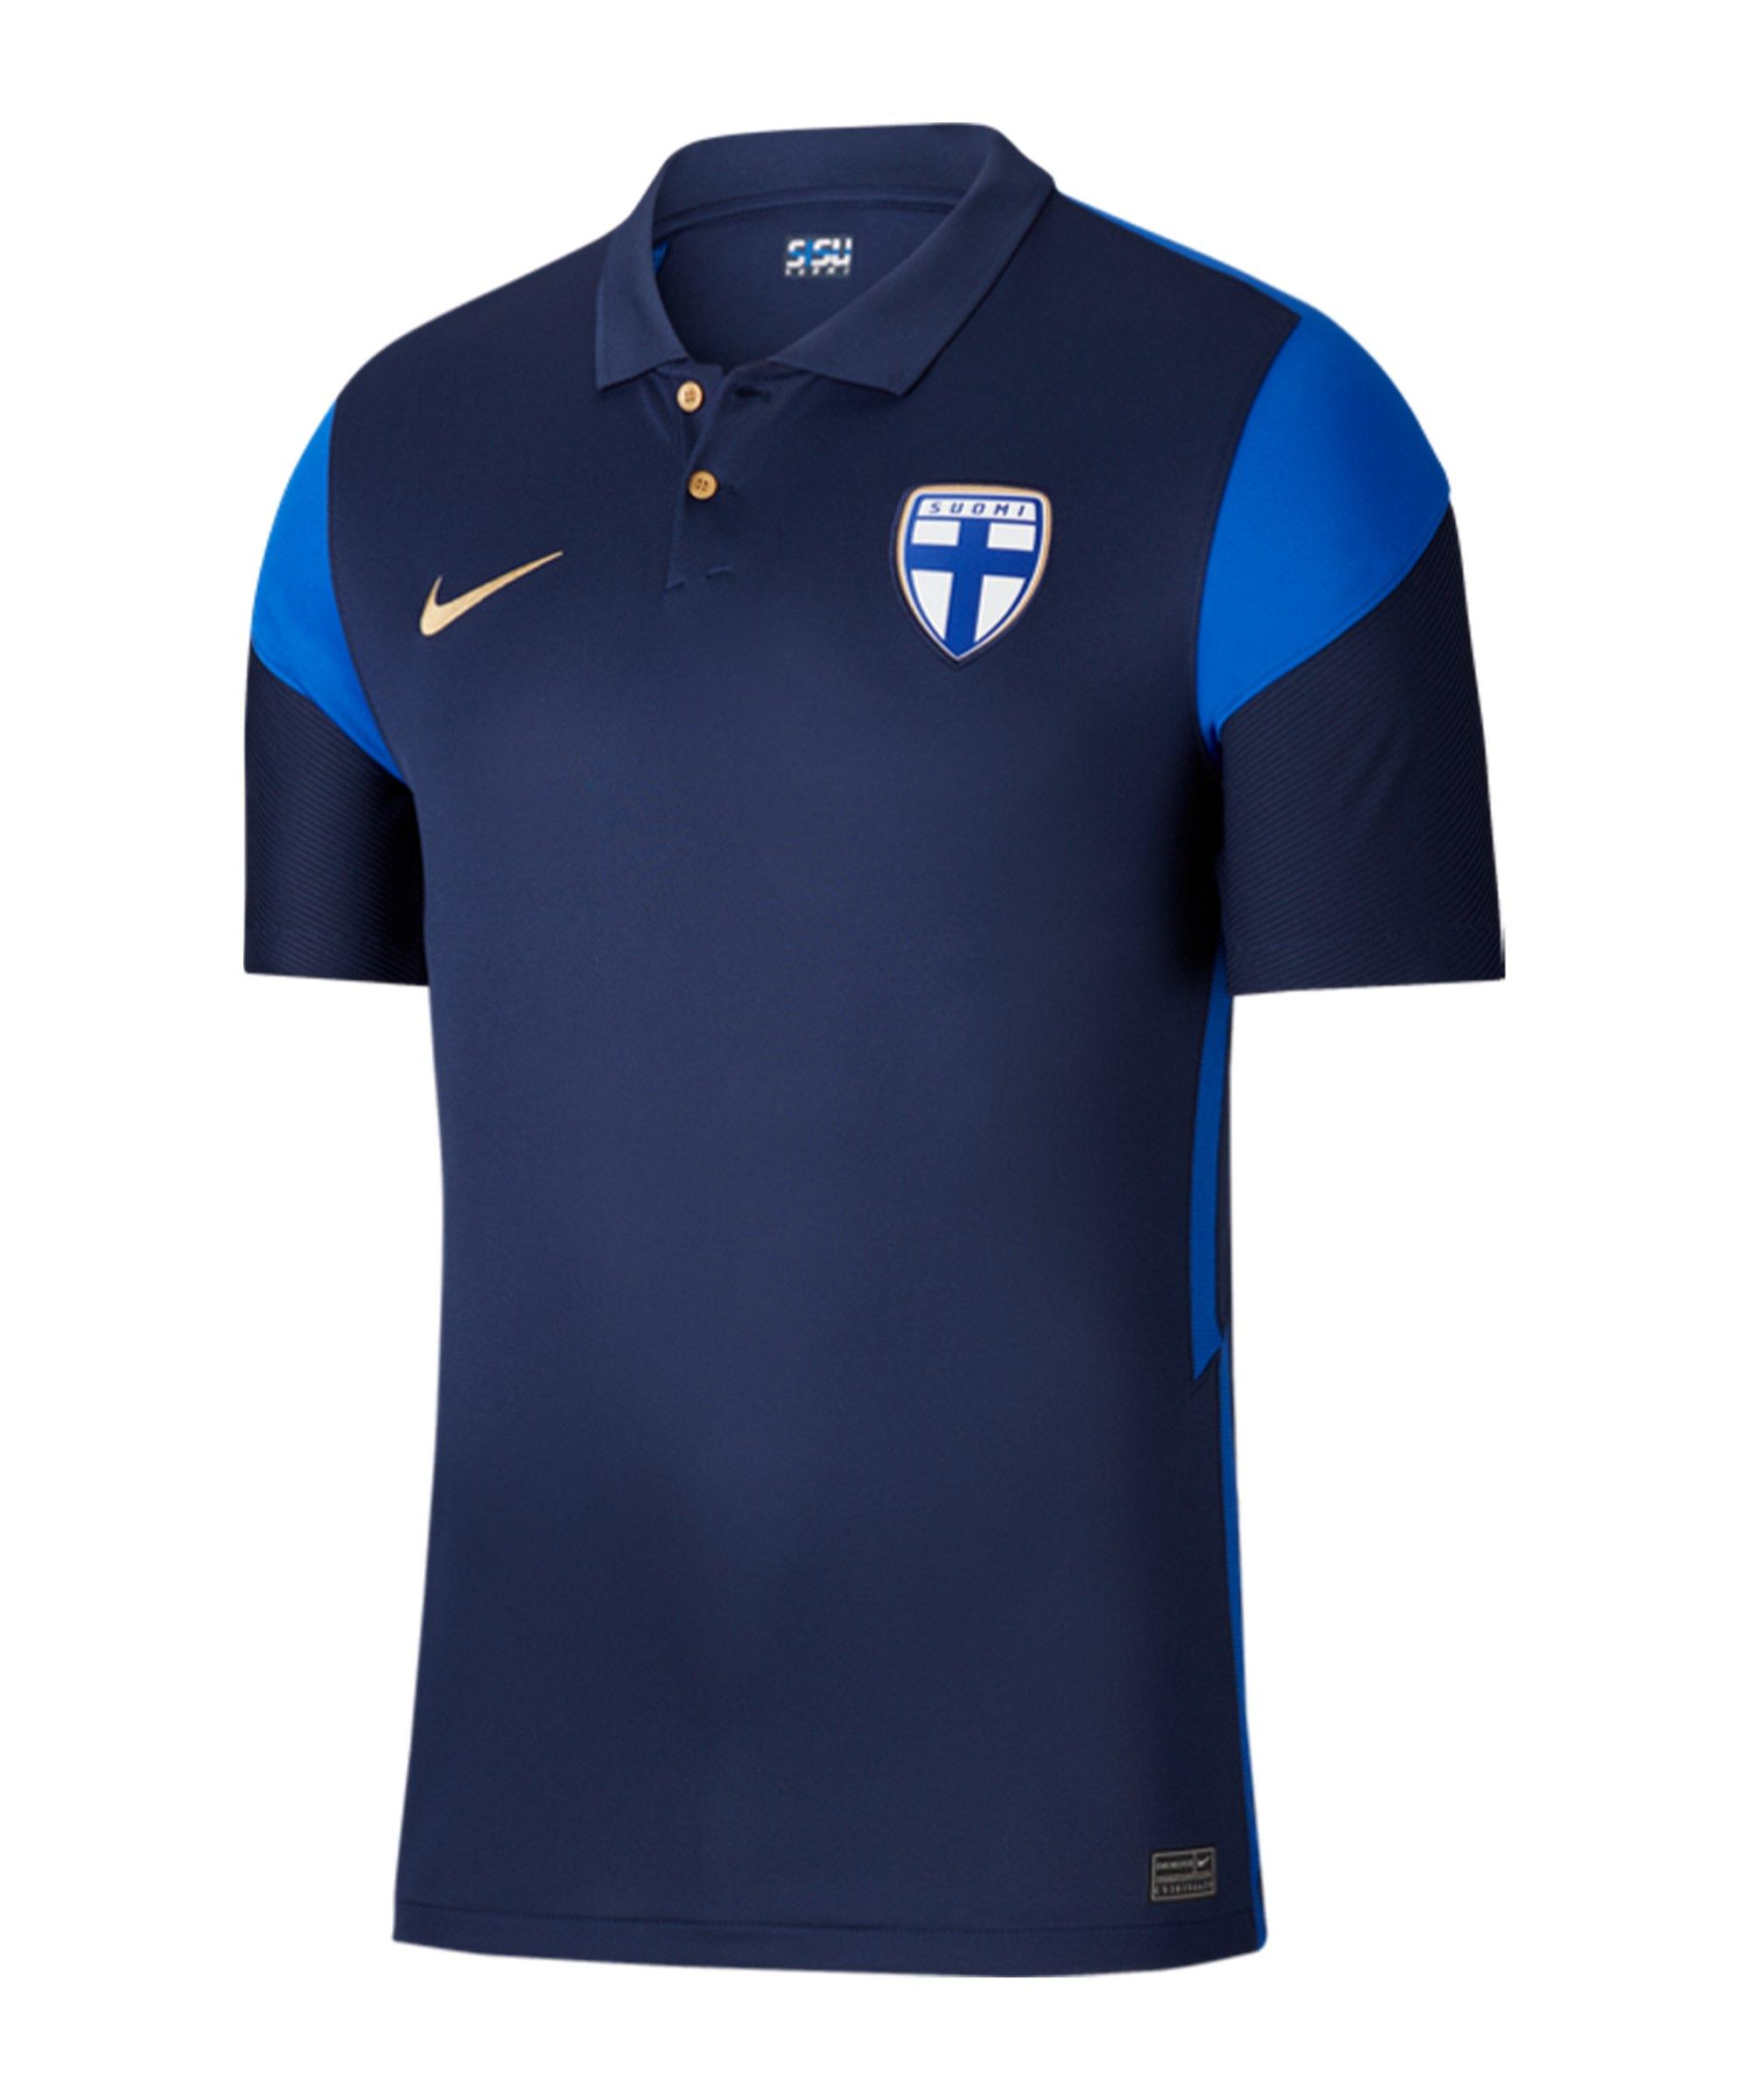 Nike Finnland Trikot Away EM 2020 Blau F410 - blau